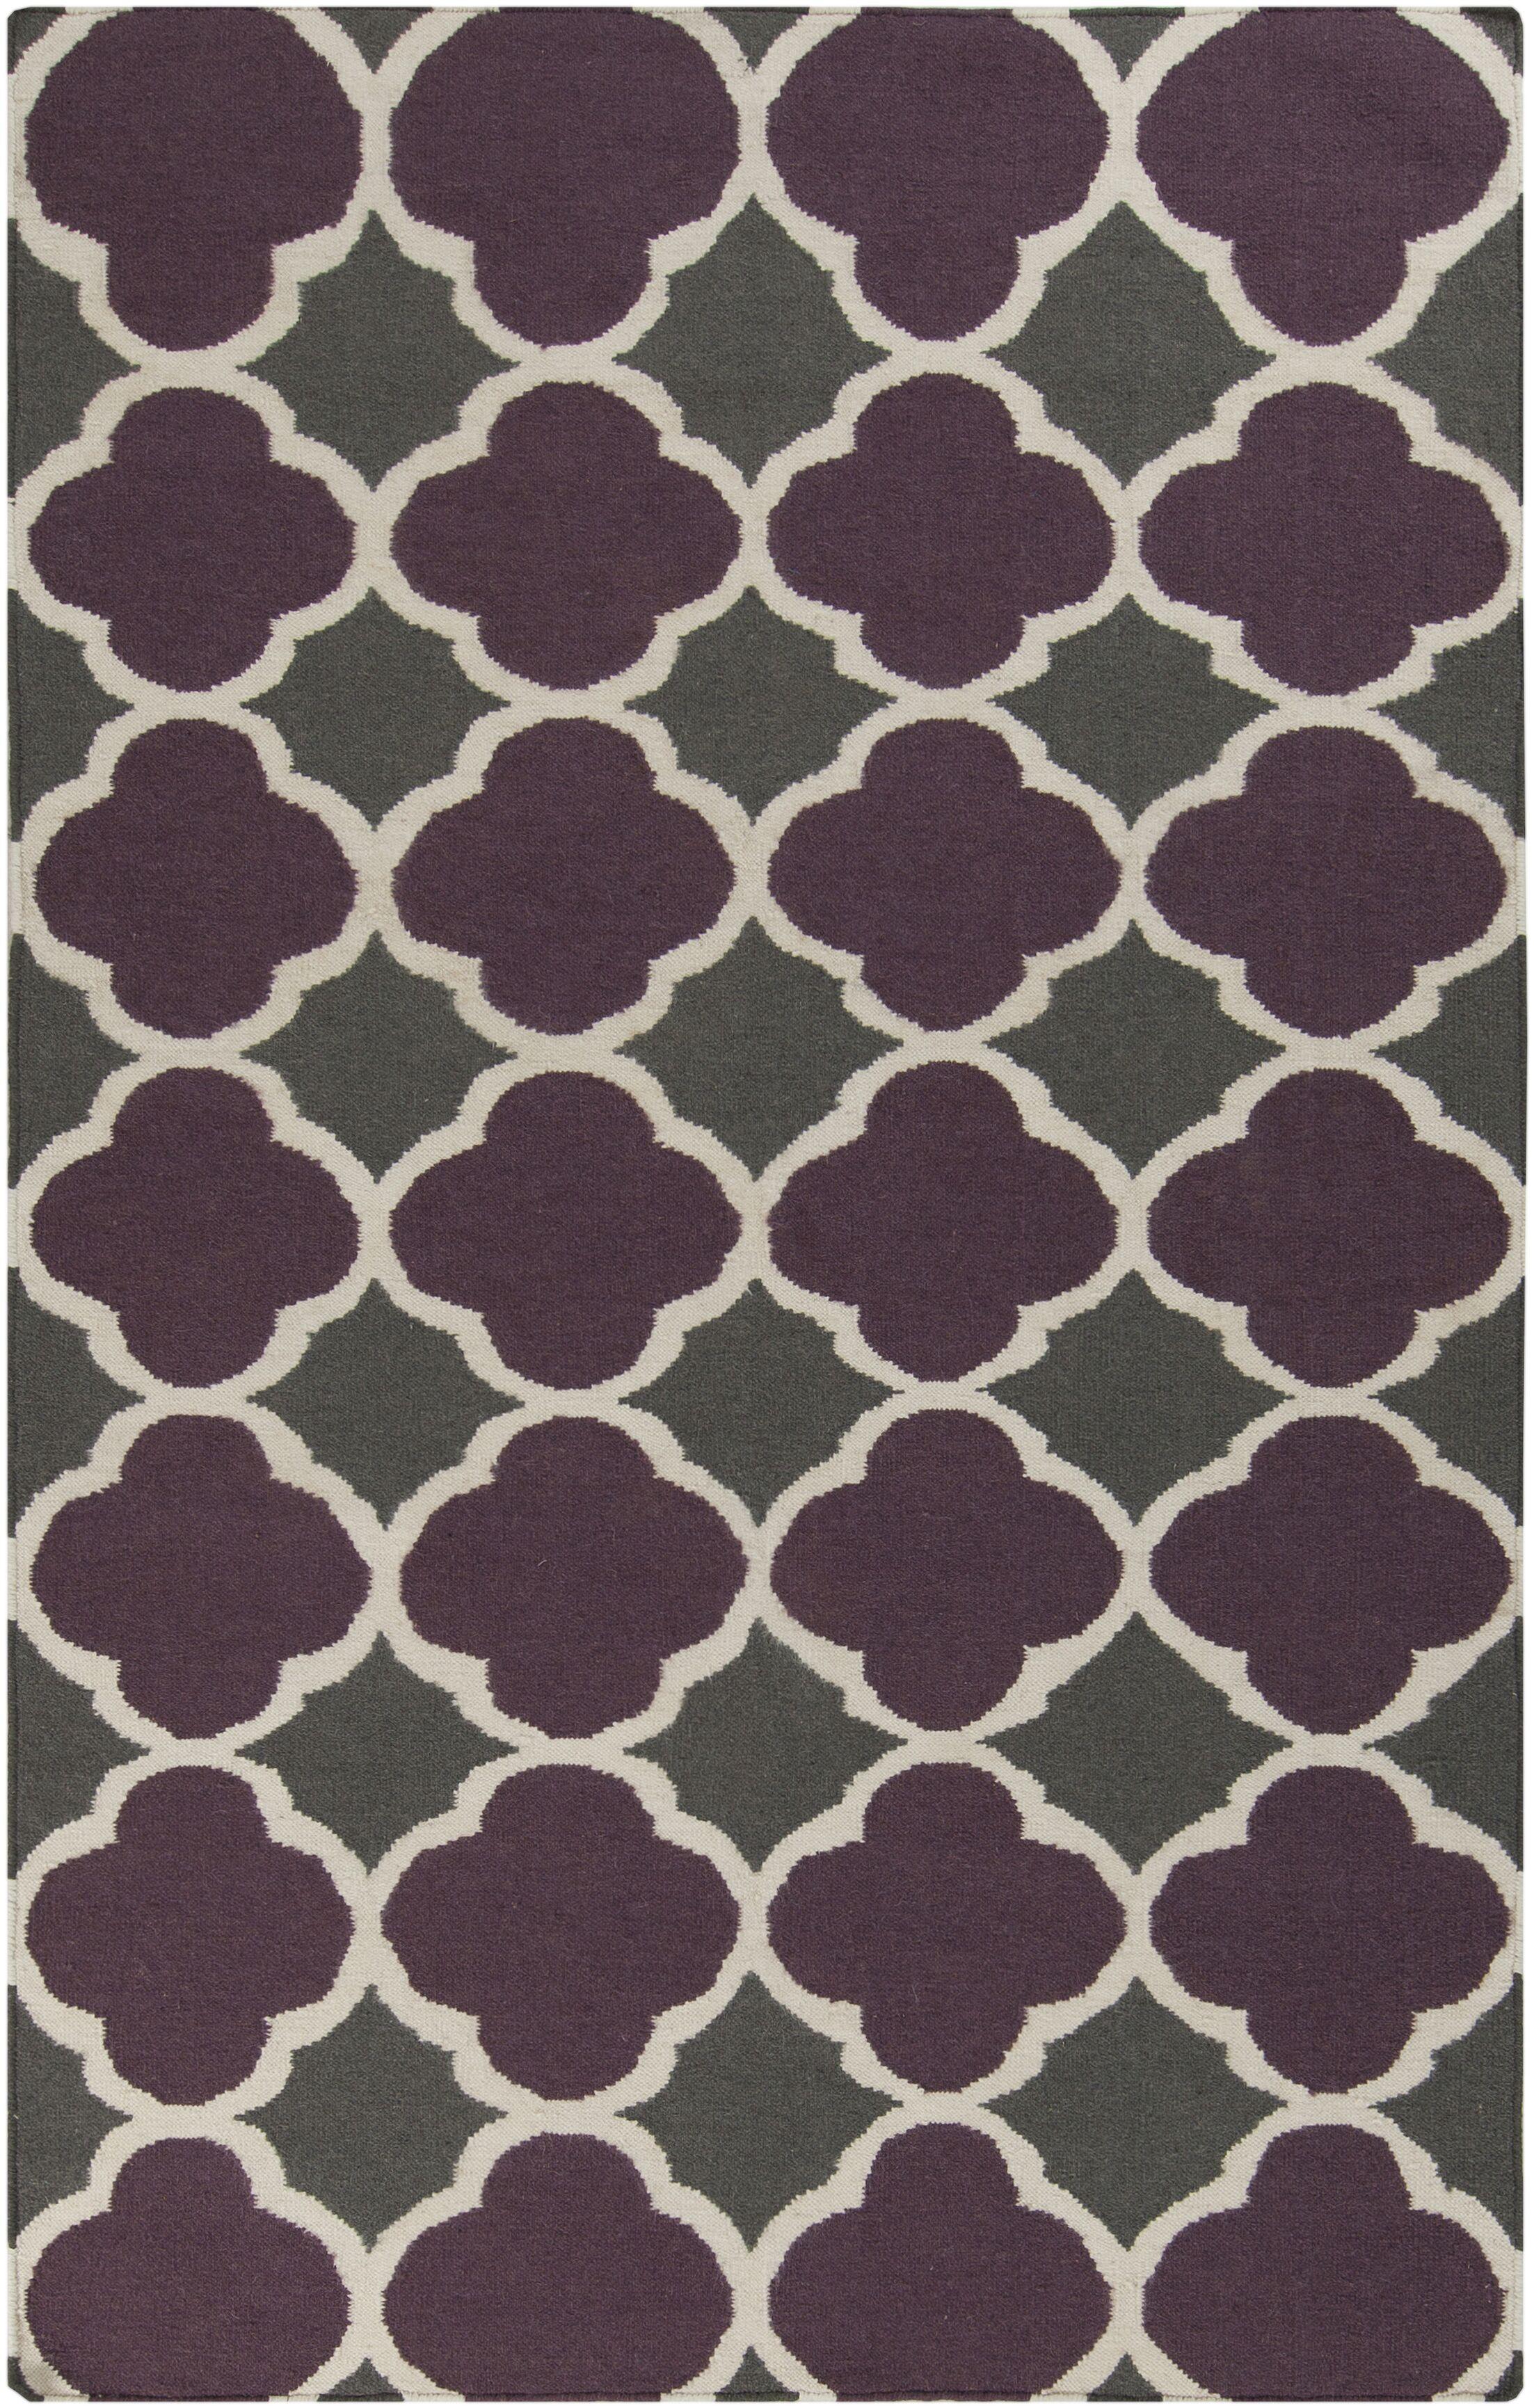 Donley Prune Purple Geometric Area Rug Rug Size: Rectangle 5' x 8'